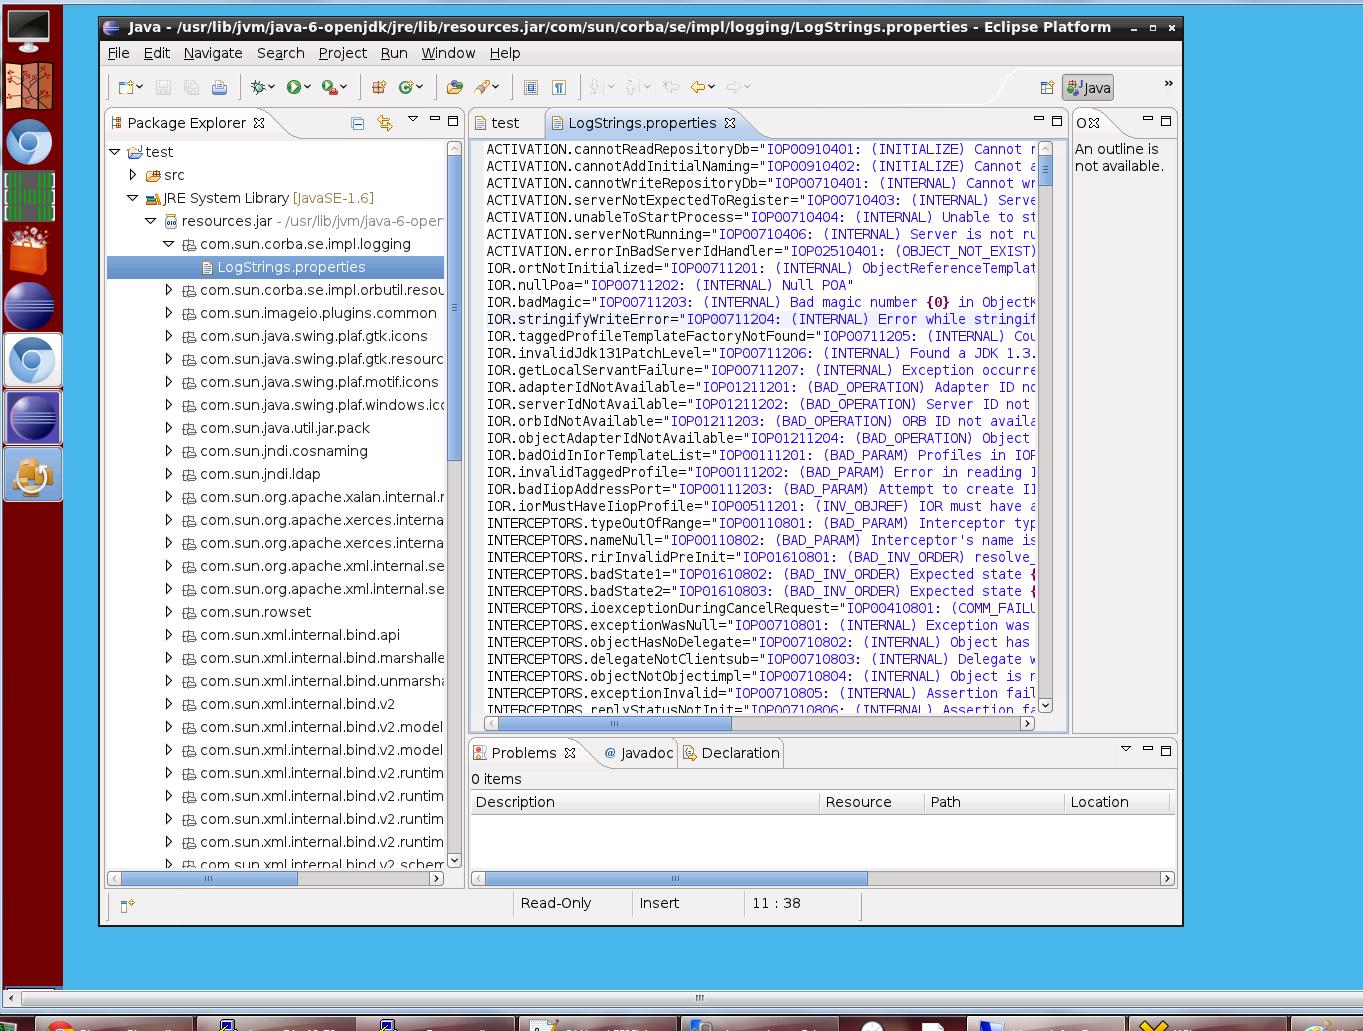 Remote Desktop from Windows7 into Ubuntu on AWS | g3n0m3z